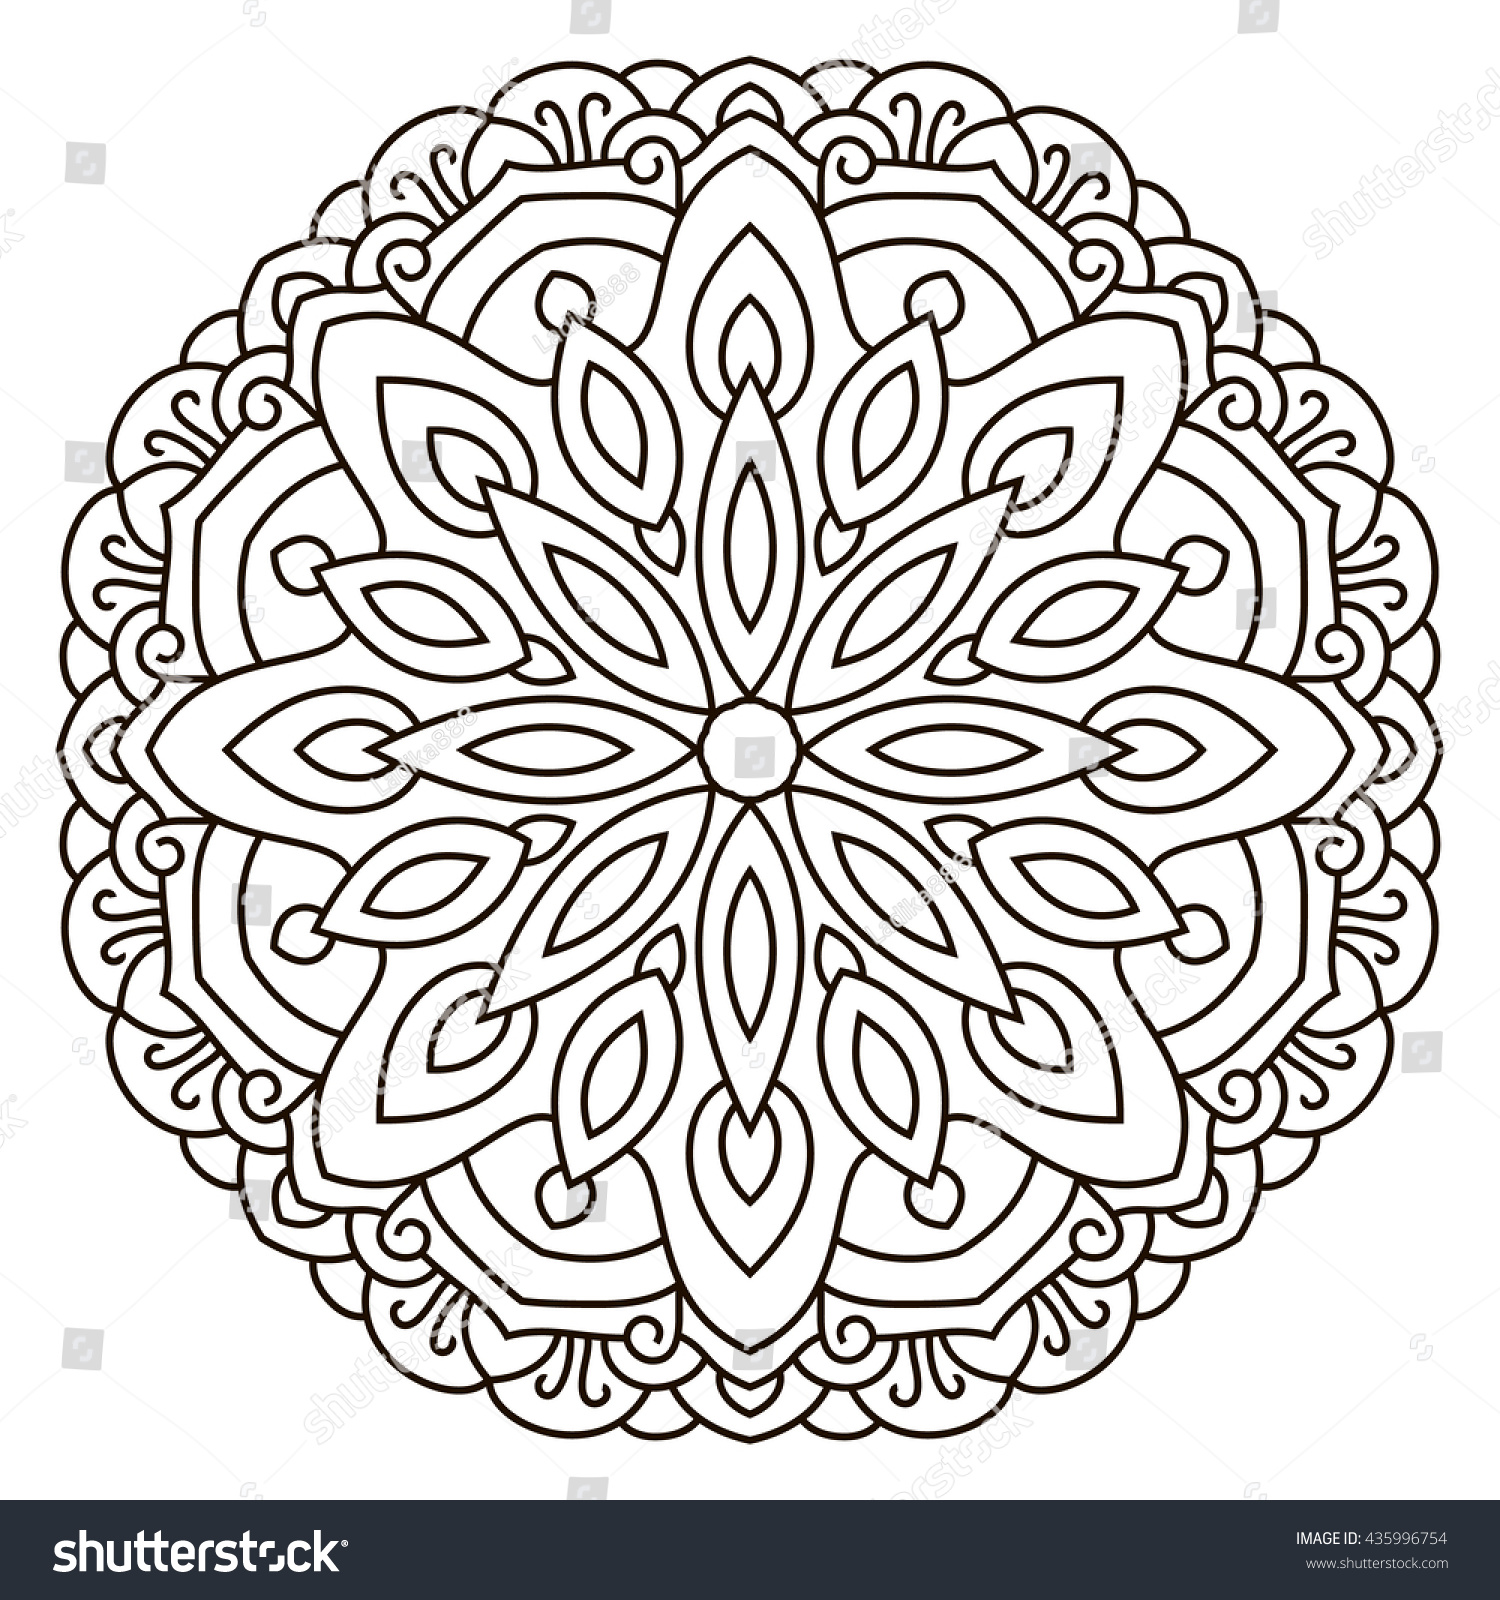 royalty free symmetrical circular pattern mandala u2026 435996754